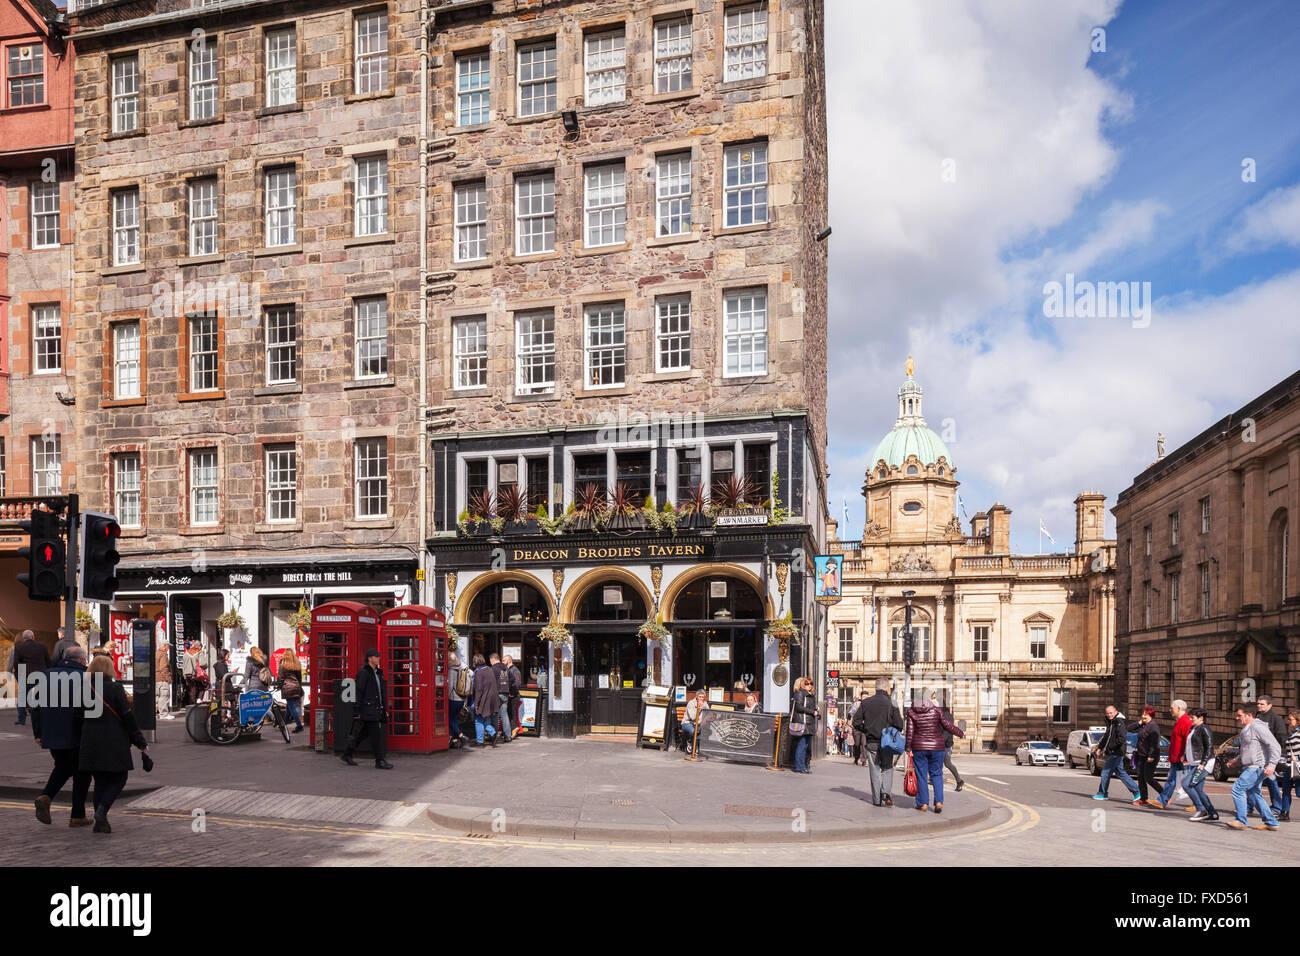 Street scene in the Royal Mile, Edinburgh, with Deacon Brodie's Tavern, Scotland, UK - Stock Image